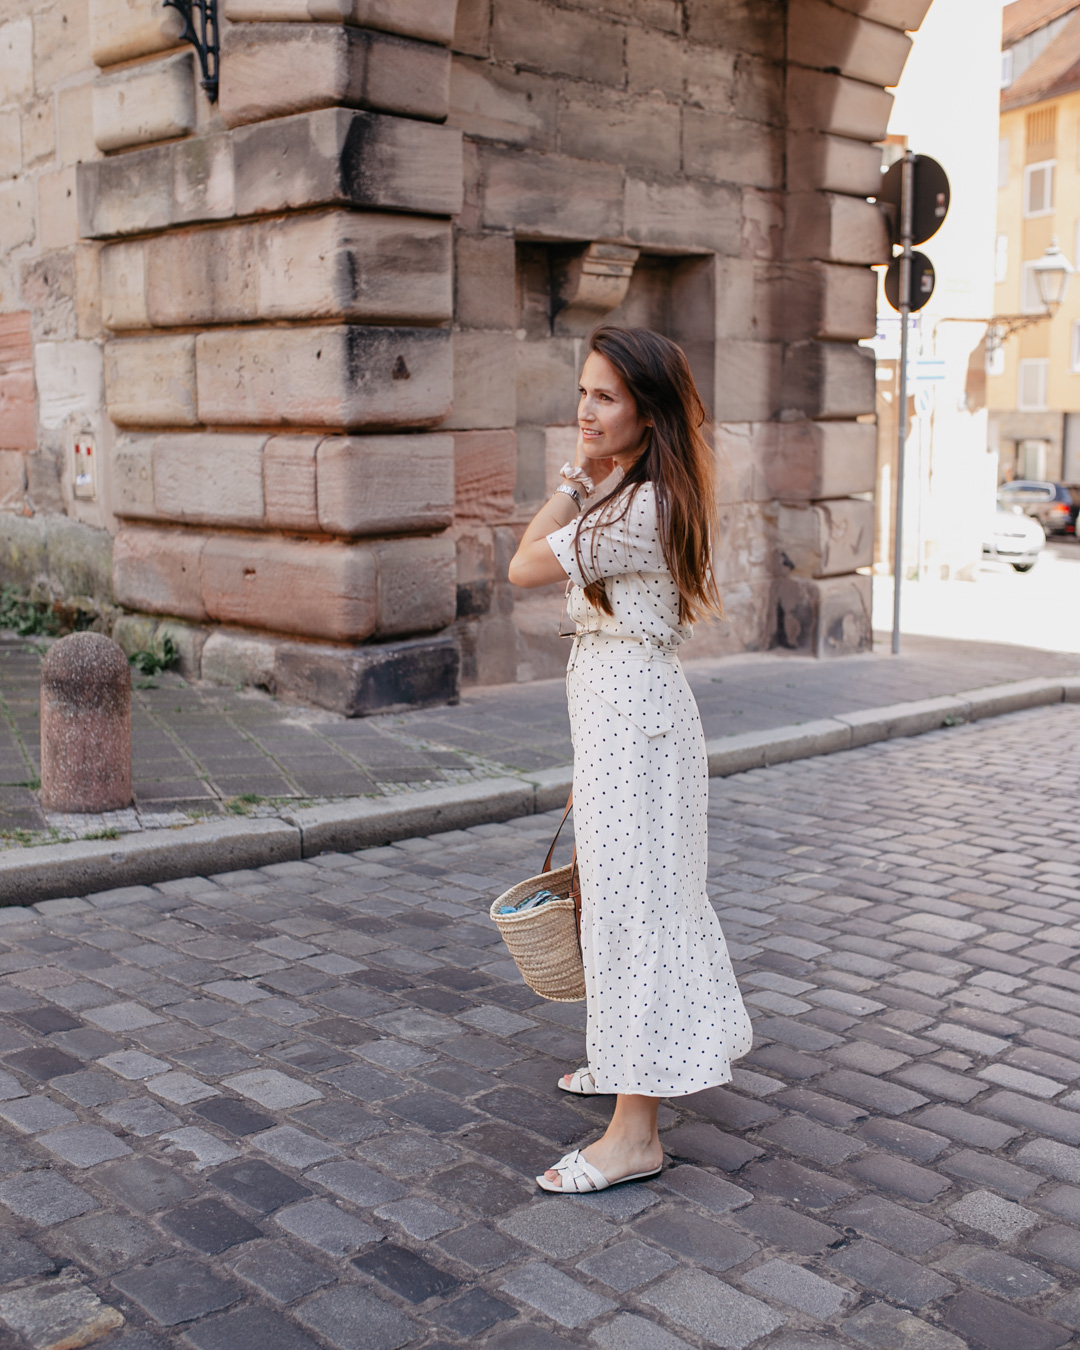 Sommerlook mit Polka Dots Kleid - Pieces of Mariposa